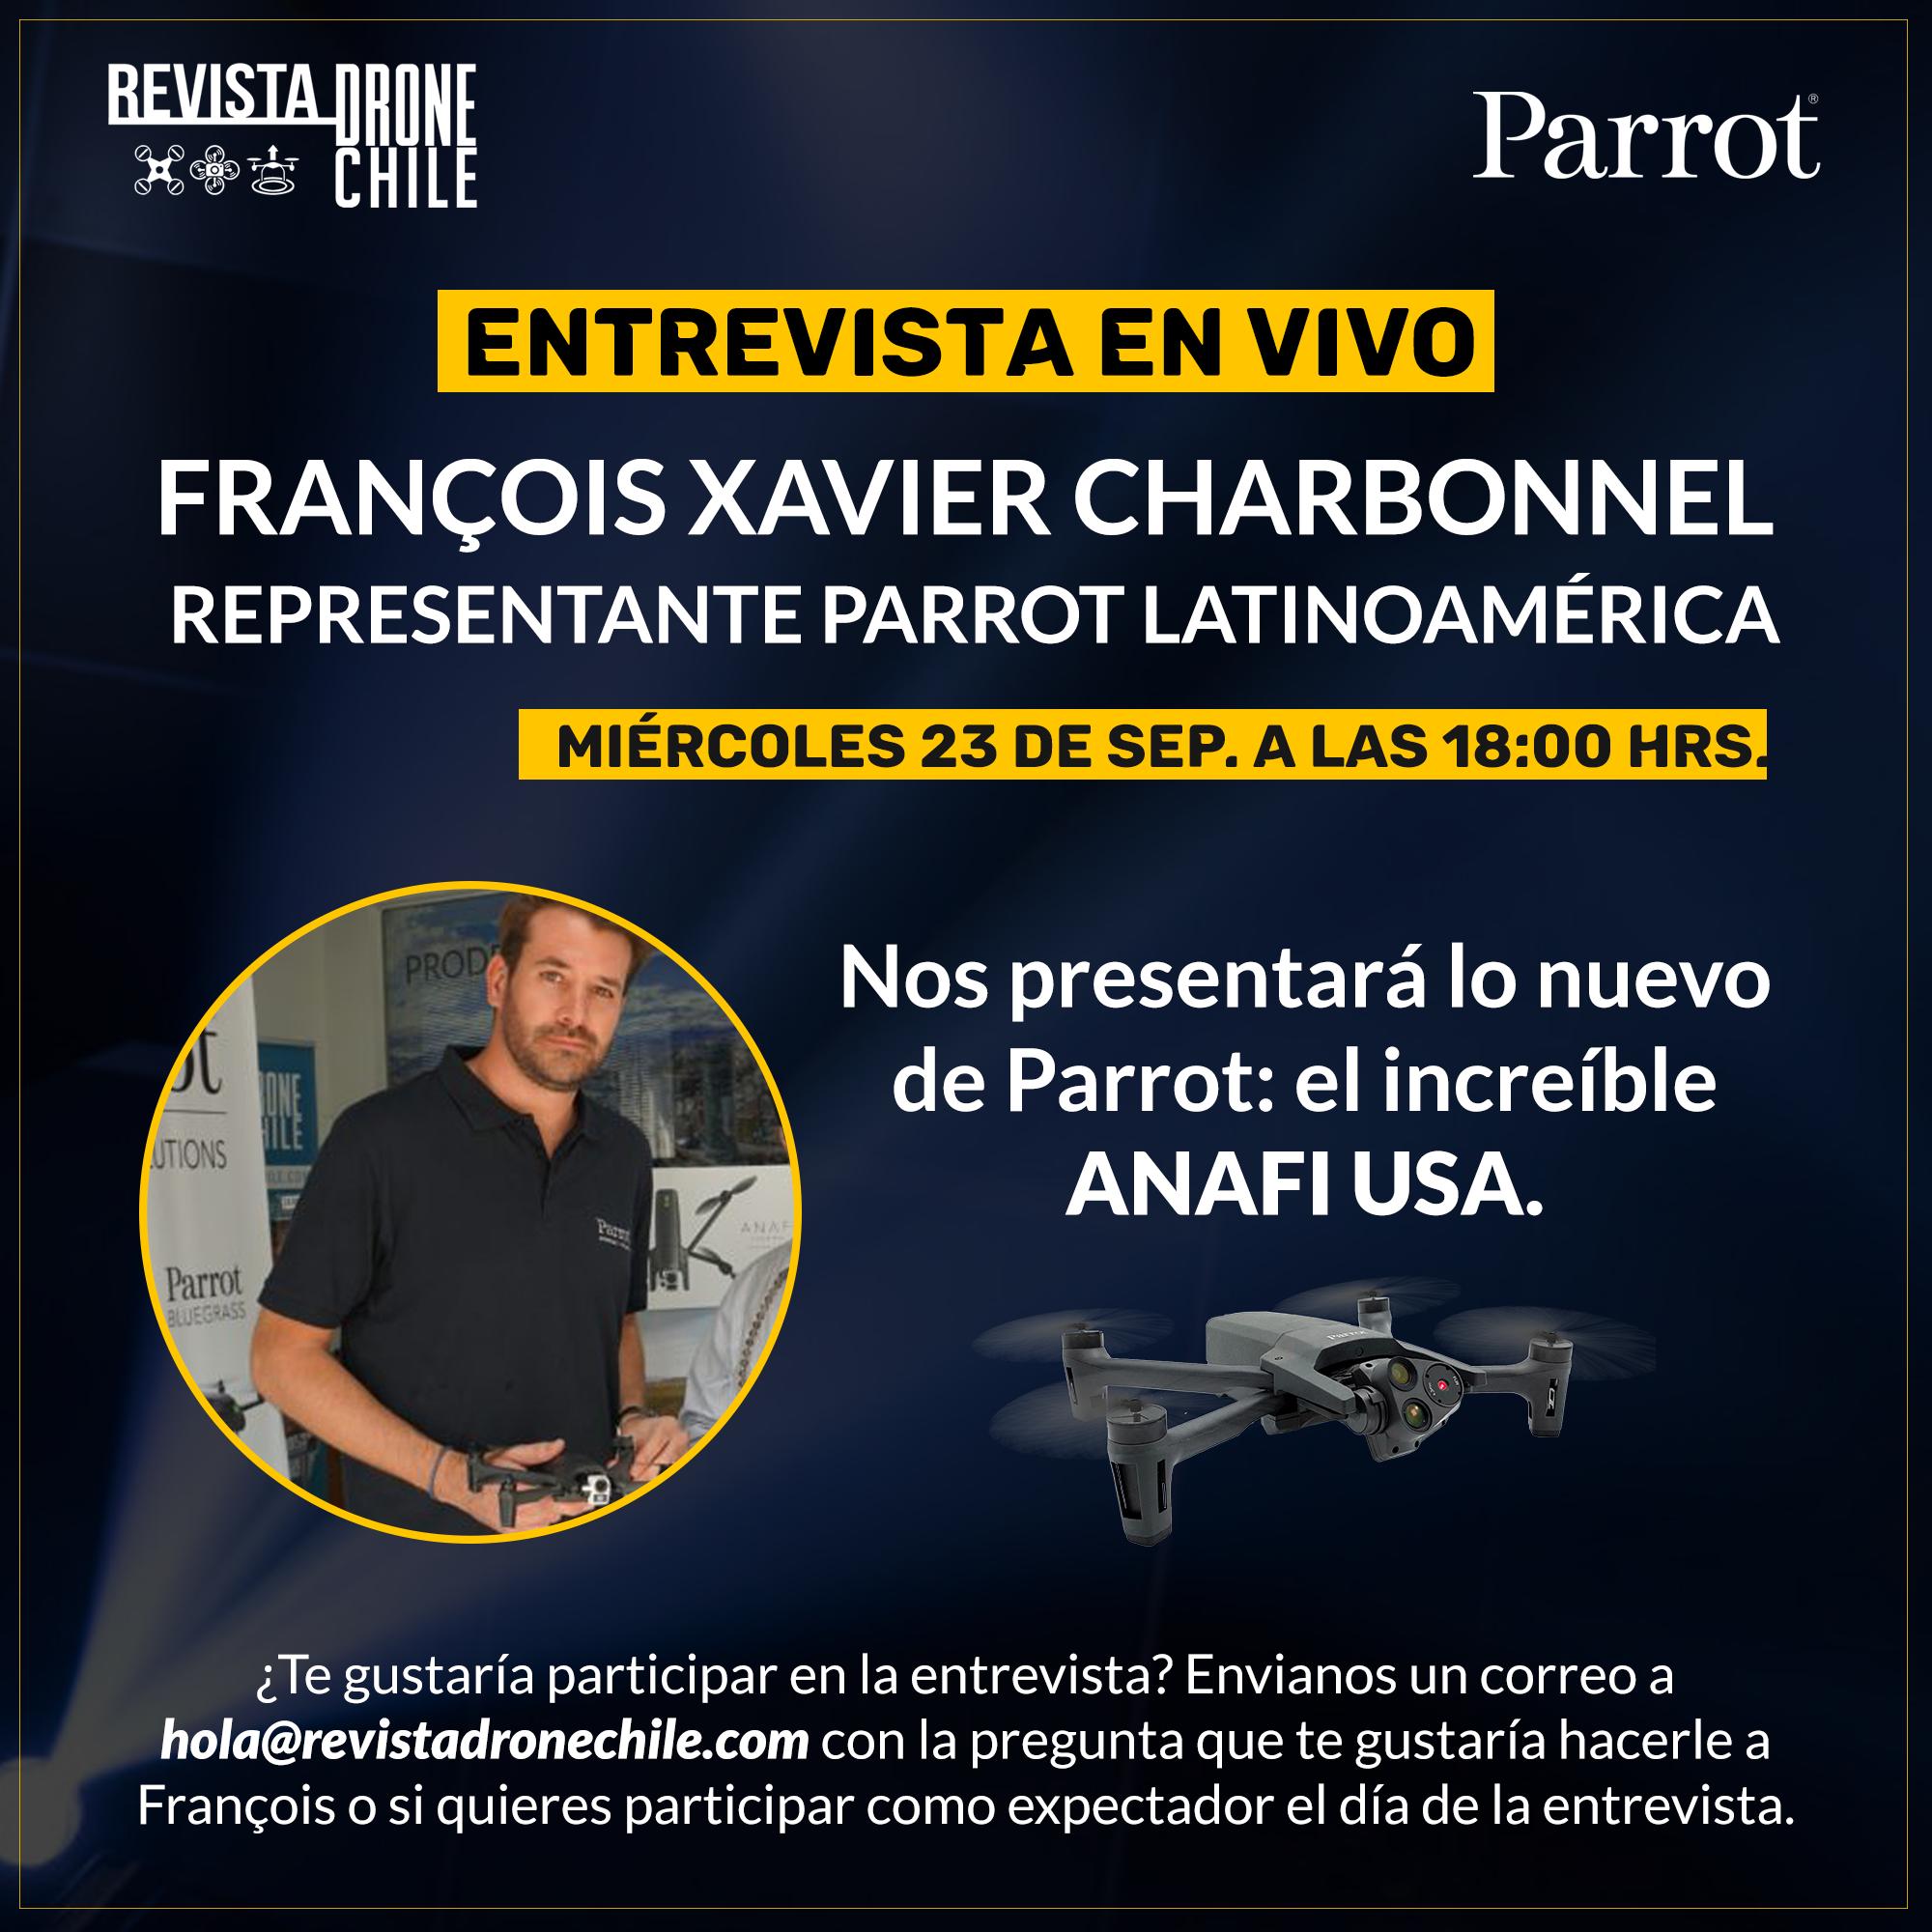 PARTICIPA EN LA ENTREVISTA EN VIVO A FRANÇOIS XAVIER CHARBONNEL – REPRESENTANTE PARROT LATINOAMÉRICA | REVISTA DRONE CHILE